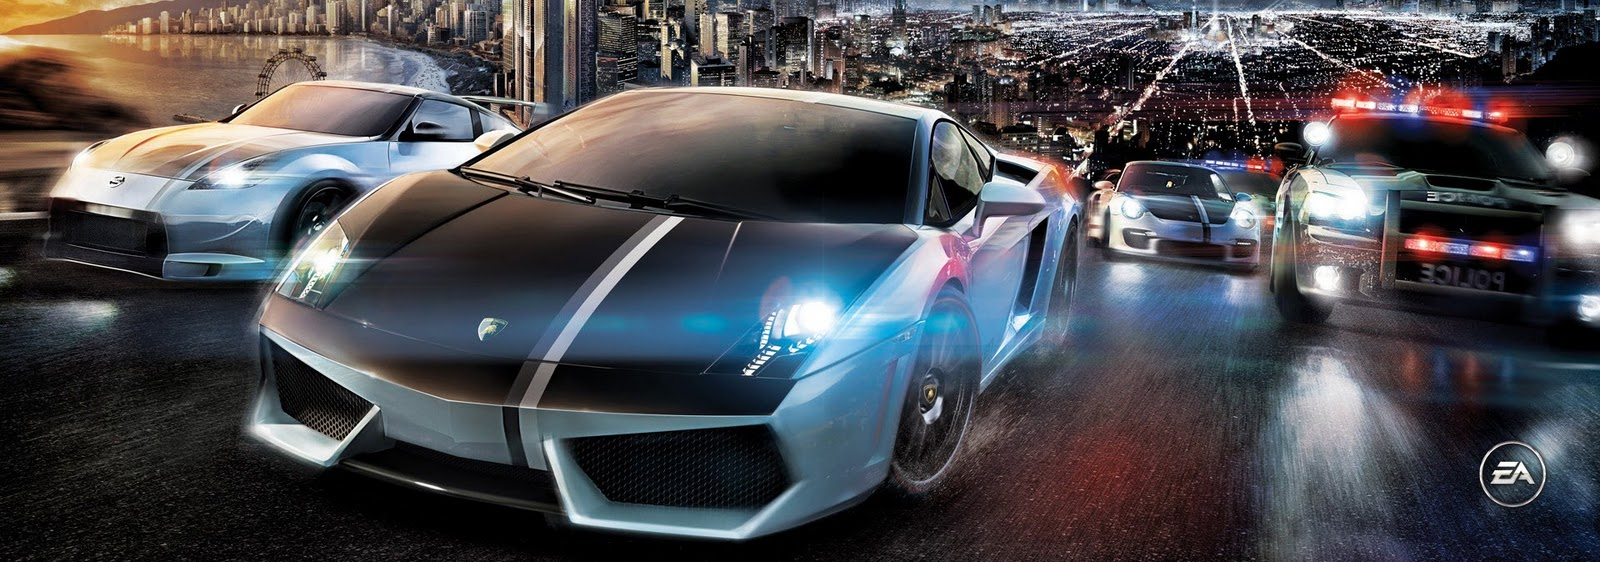 Need for speed world unlock car slots